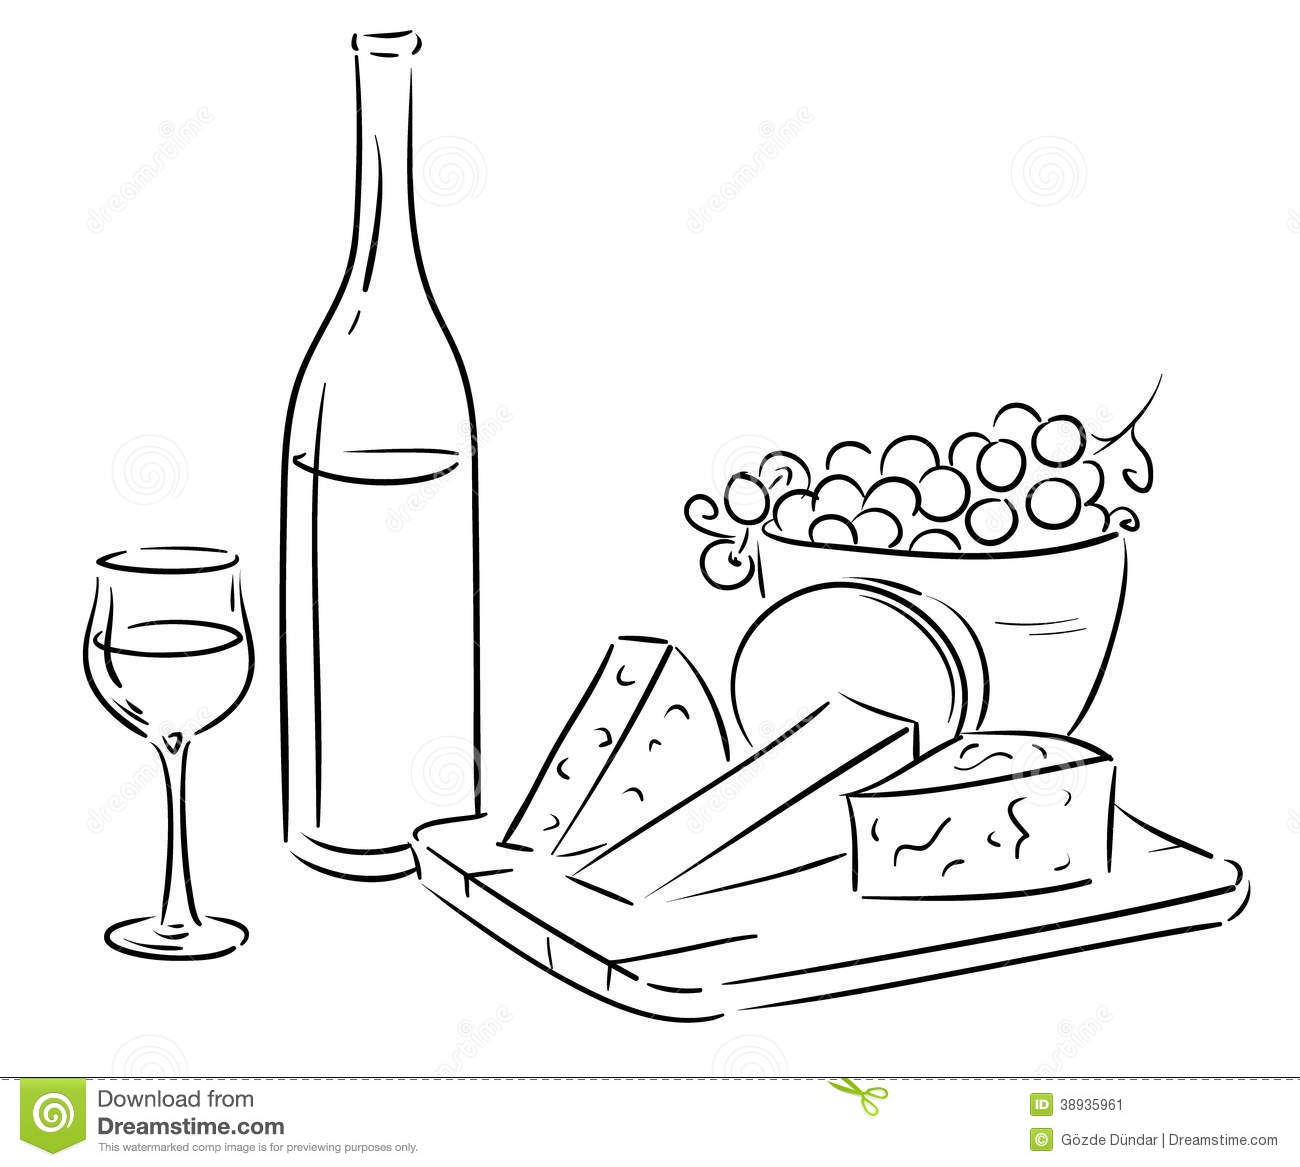 6036 Wine free clipart.